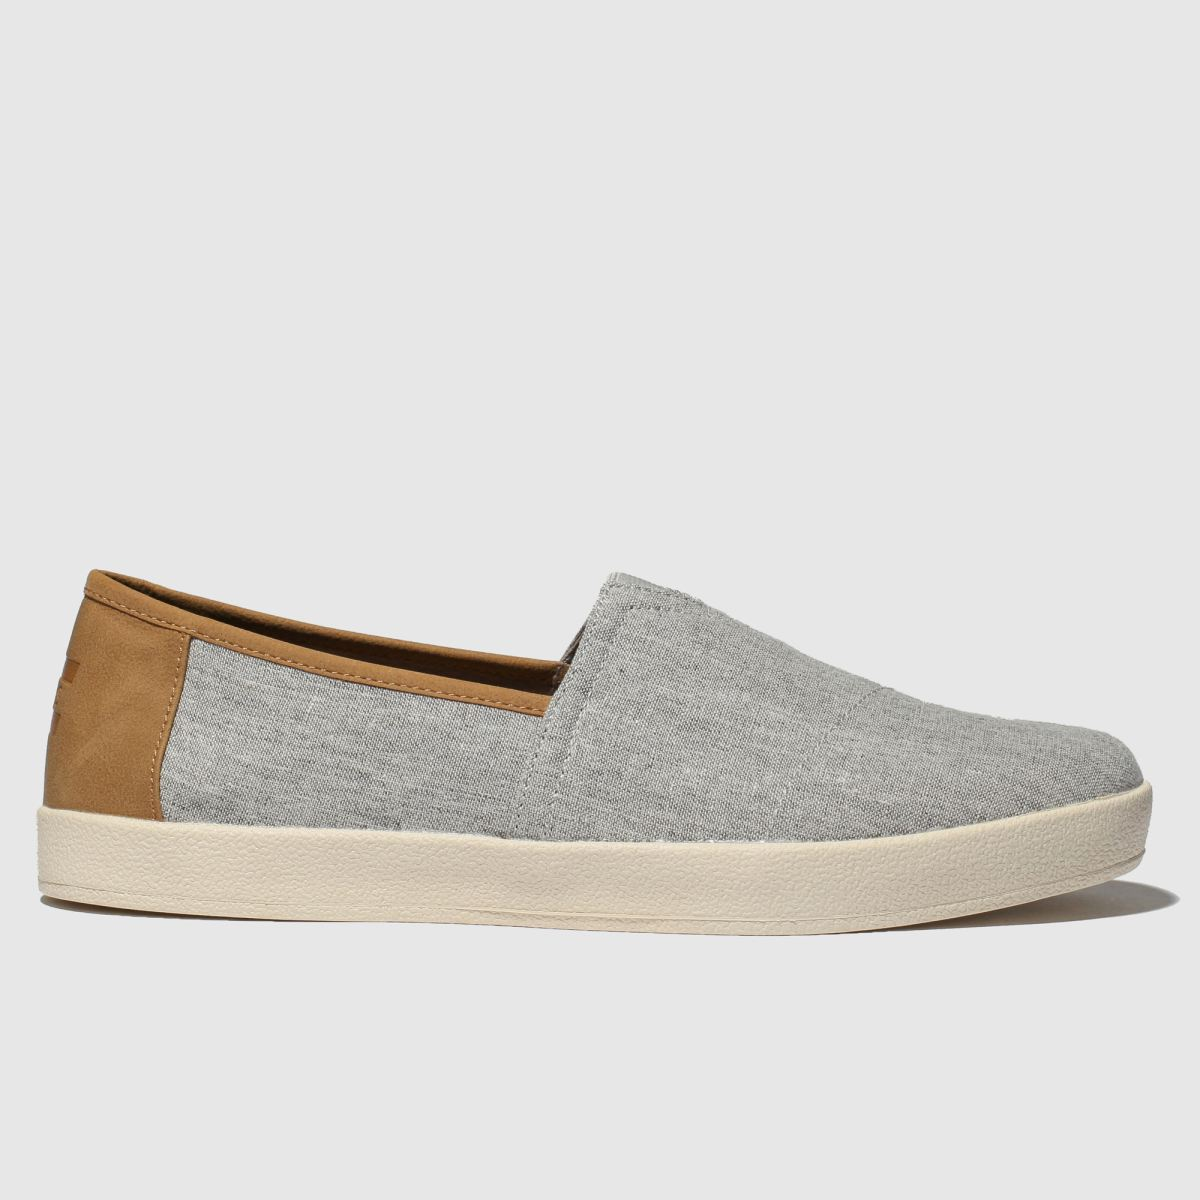 Toms Light Grey Avalon Shoes